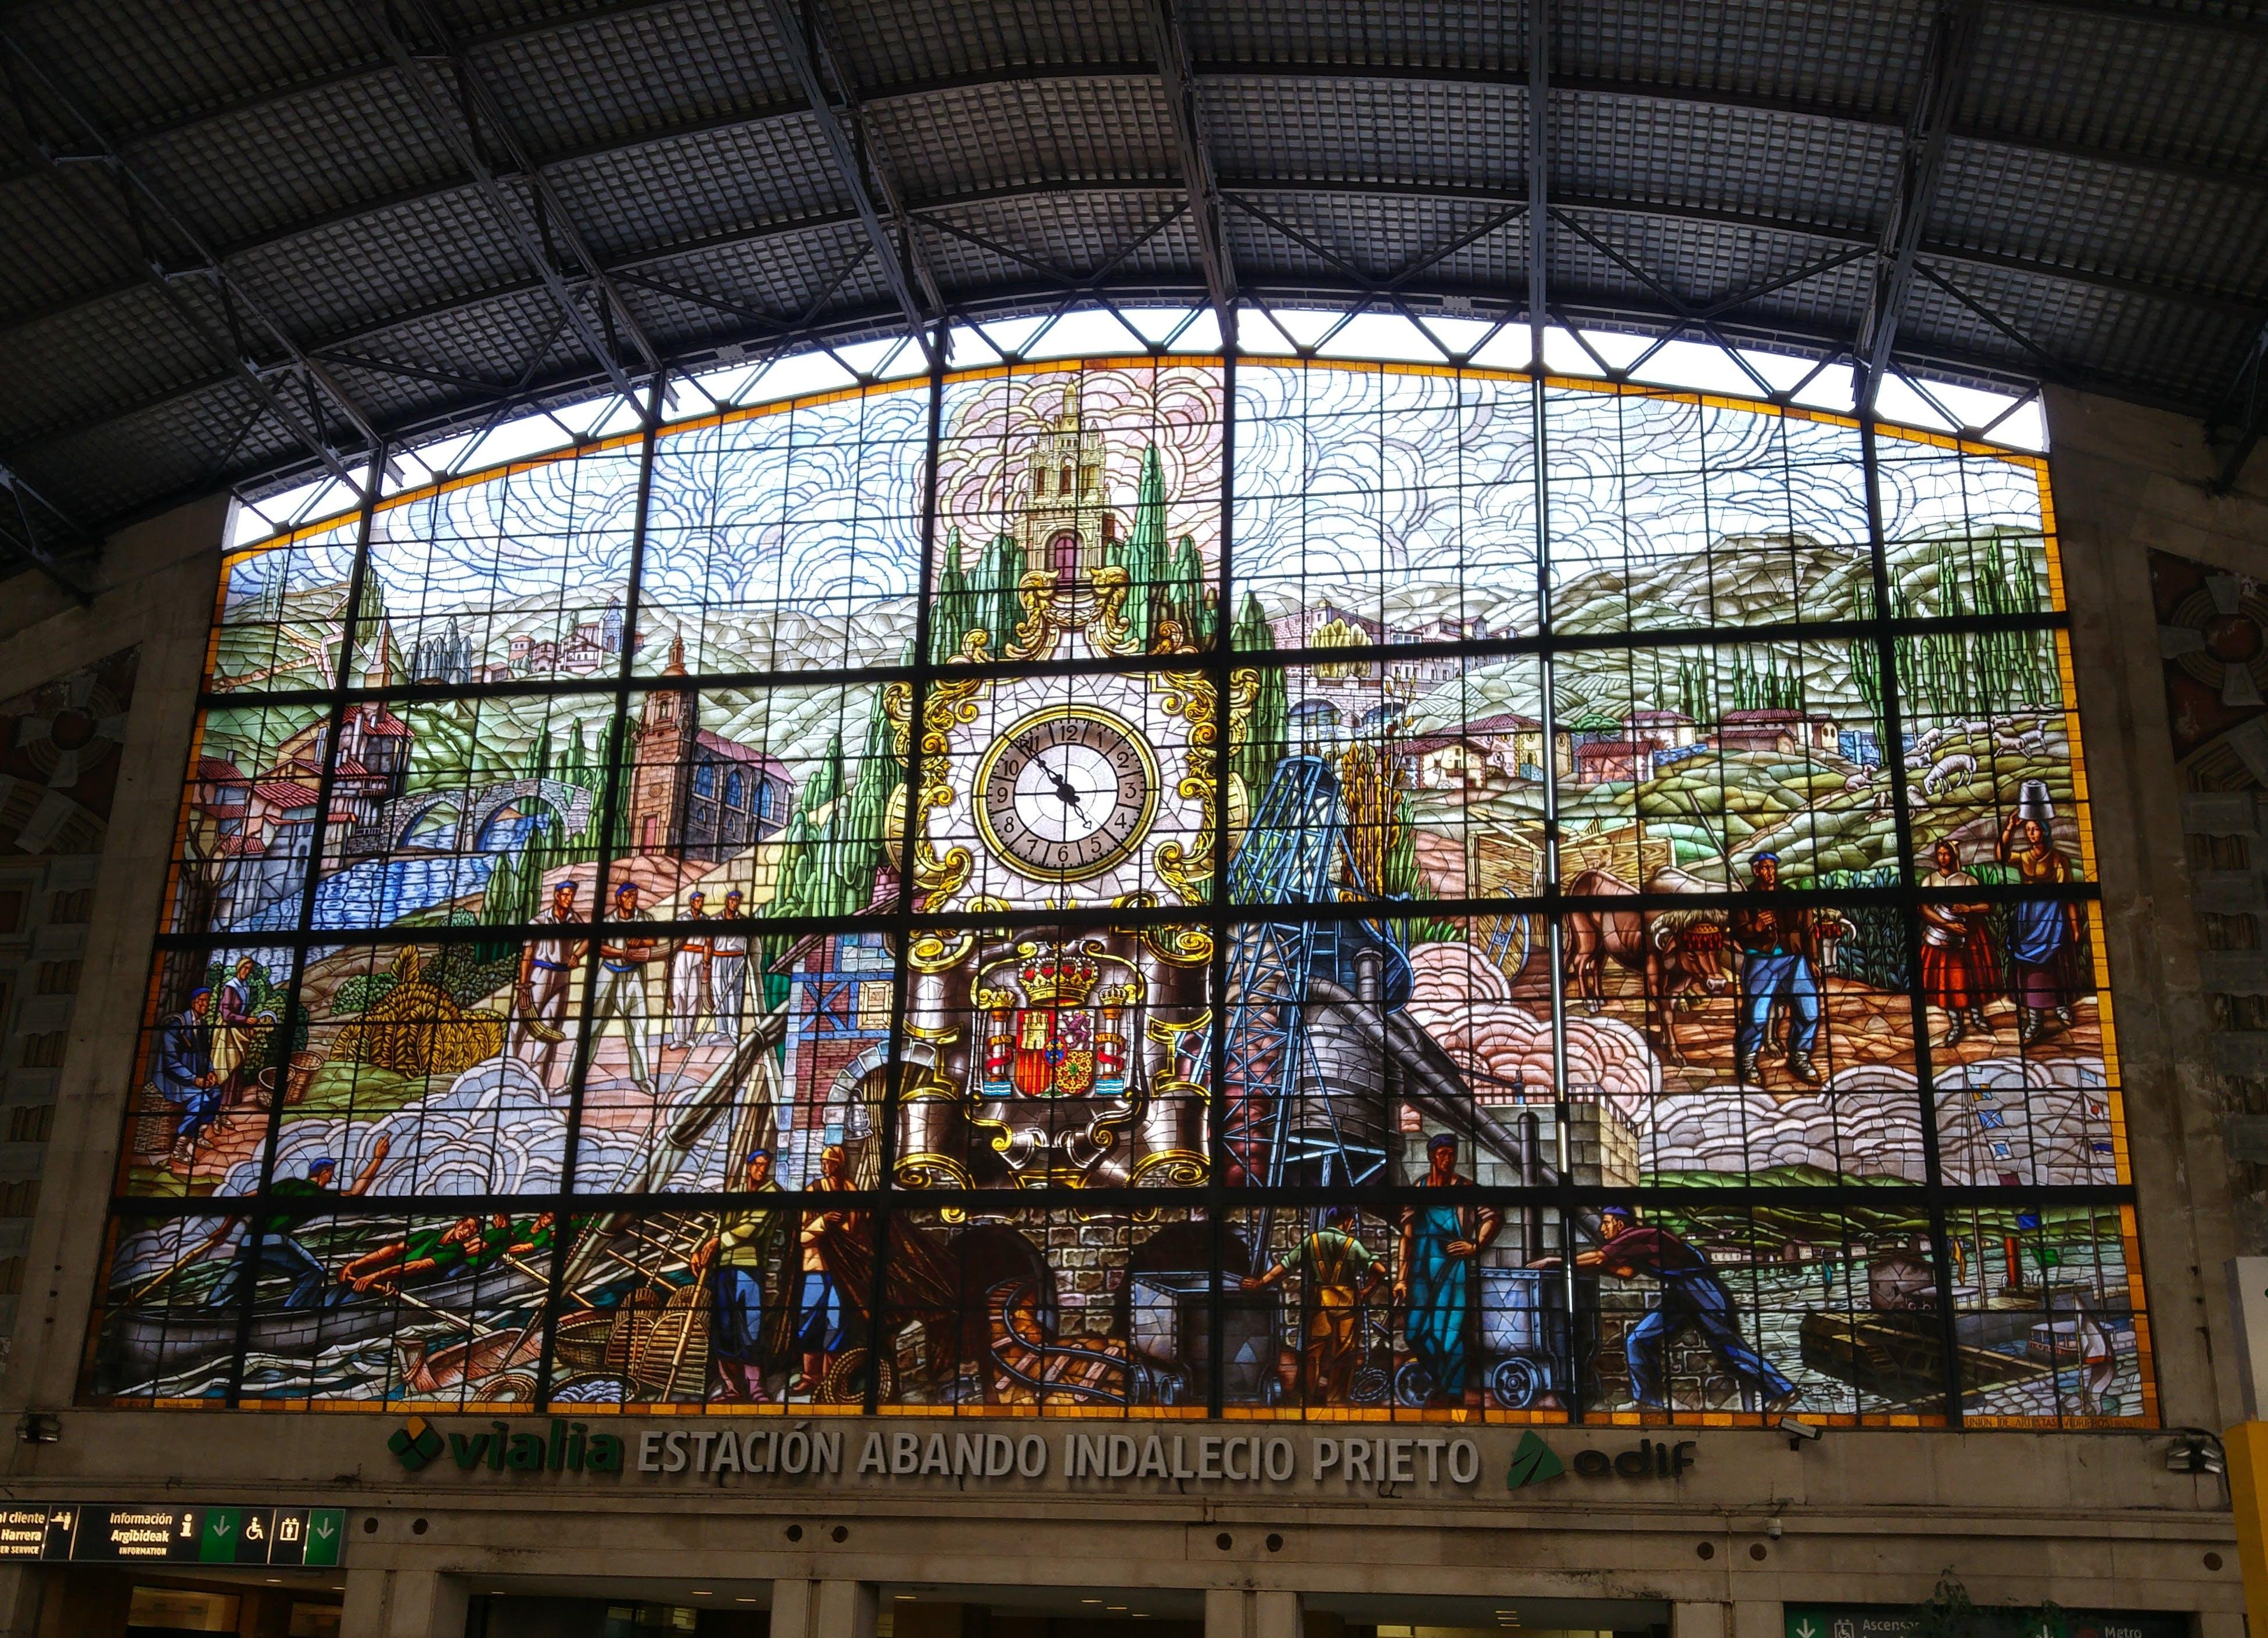 Free stock photo of bilbao, clock, facade, opaque glass window